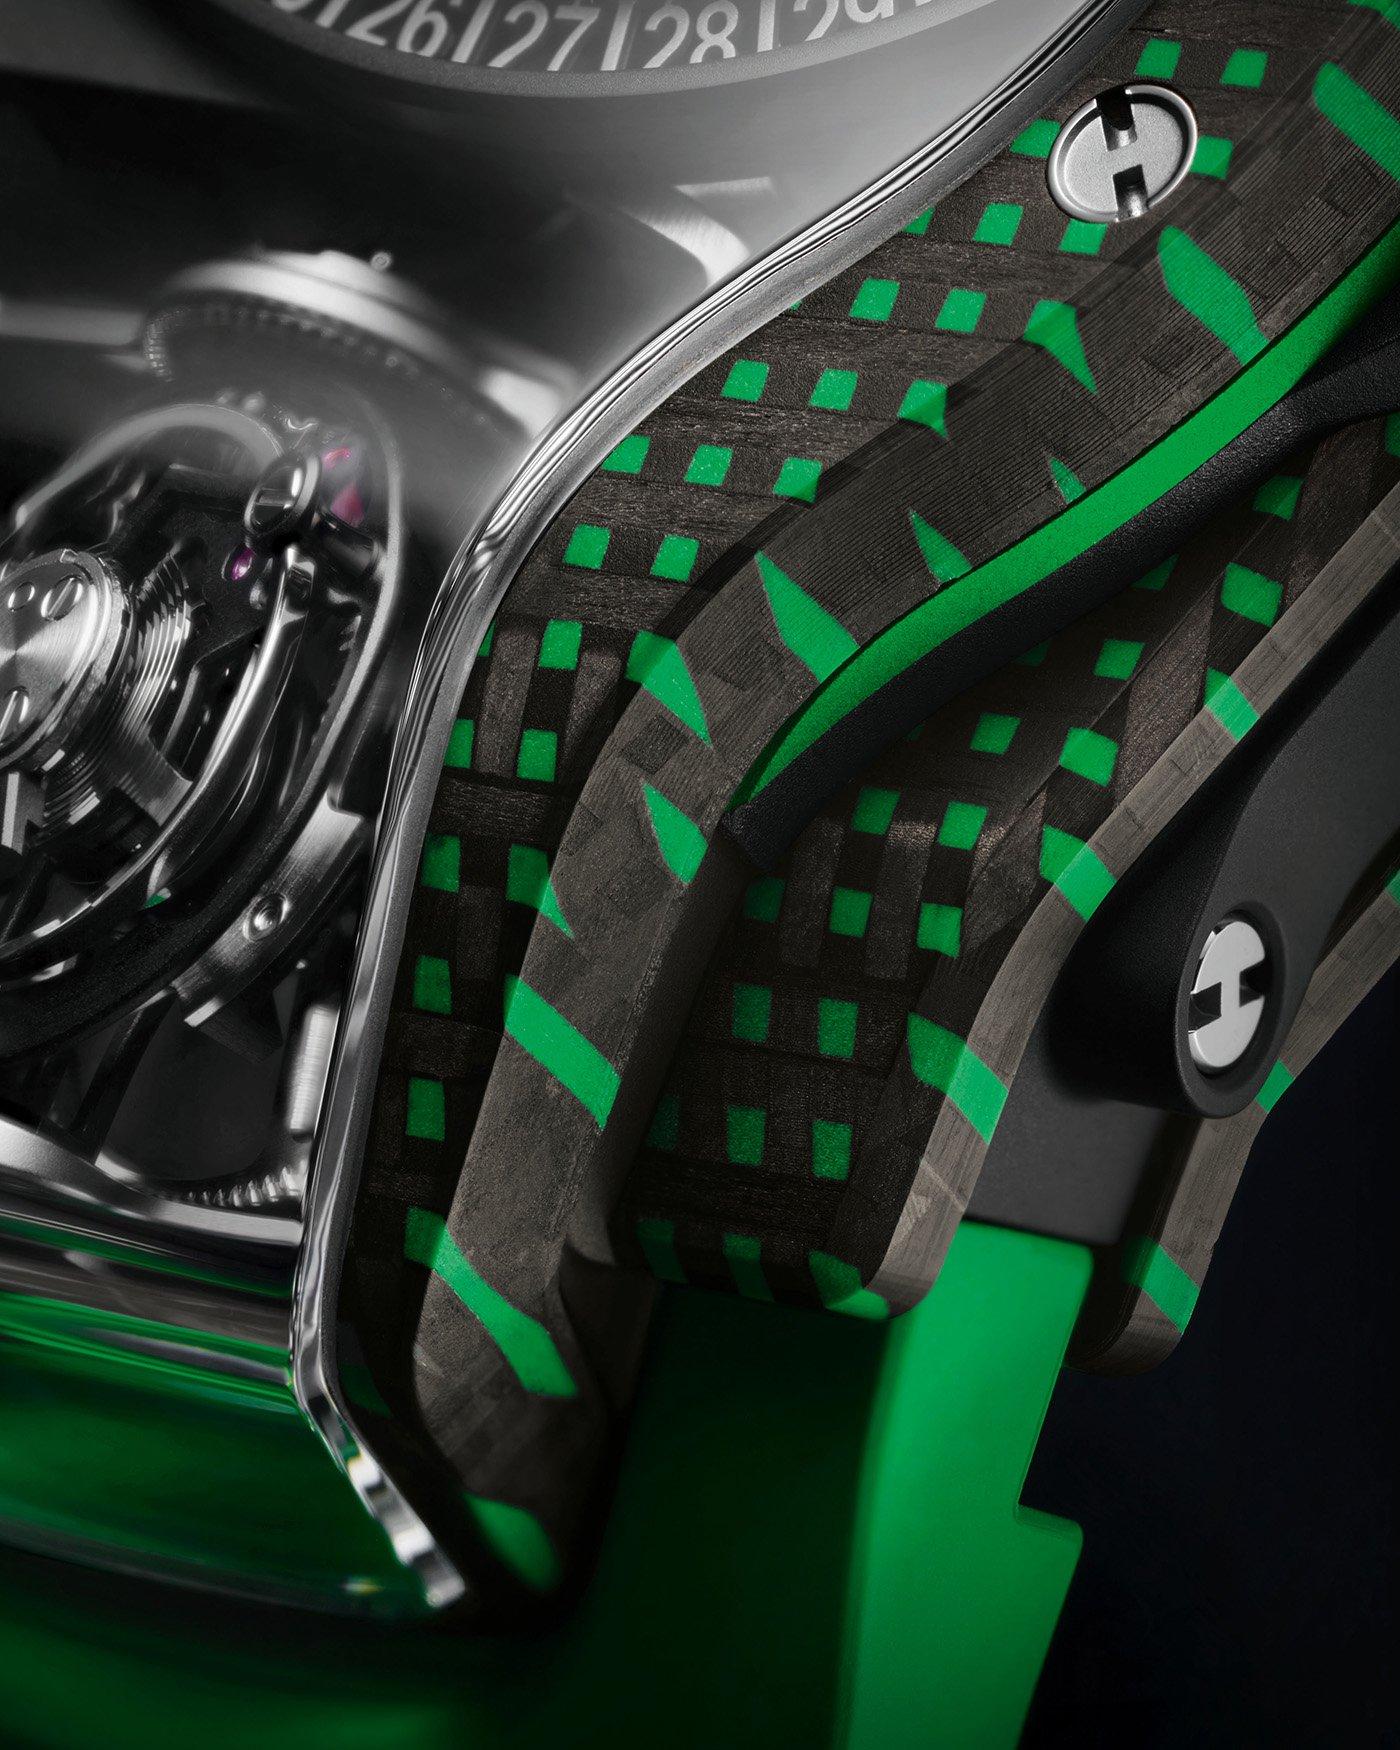 Hublot представляет ограниченную серию часов MP-09 Tourbillon Bi-Axis 5 Days Power Reserve 3D Carbon